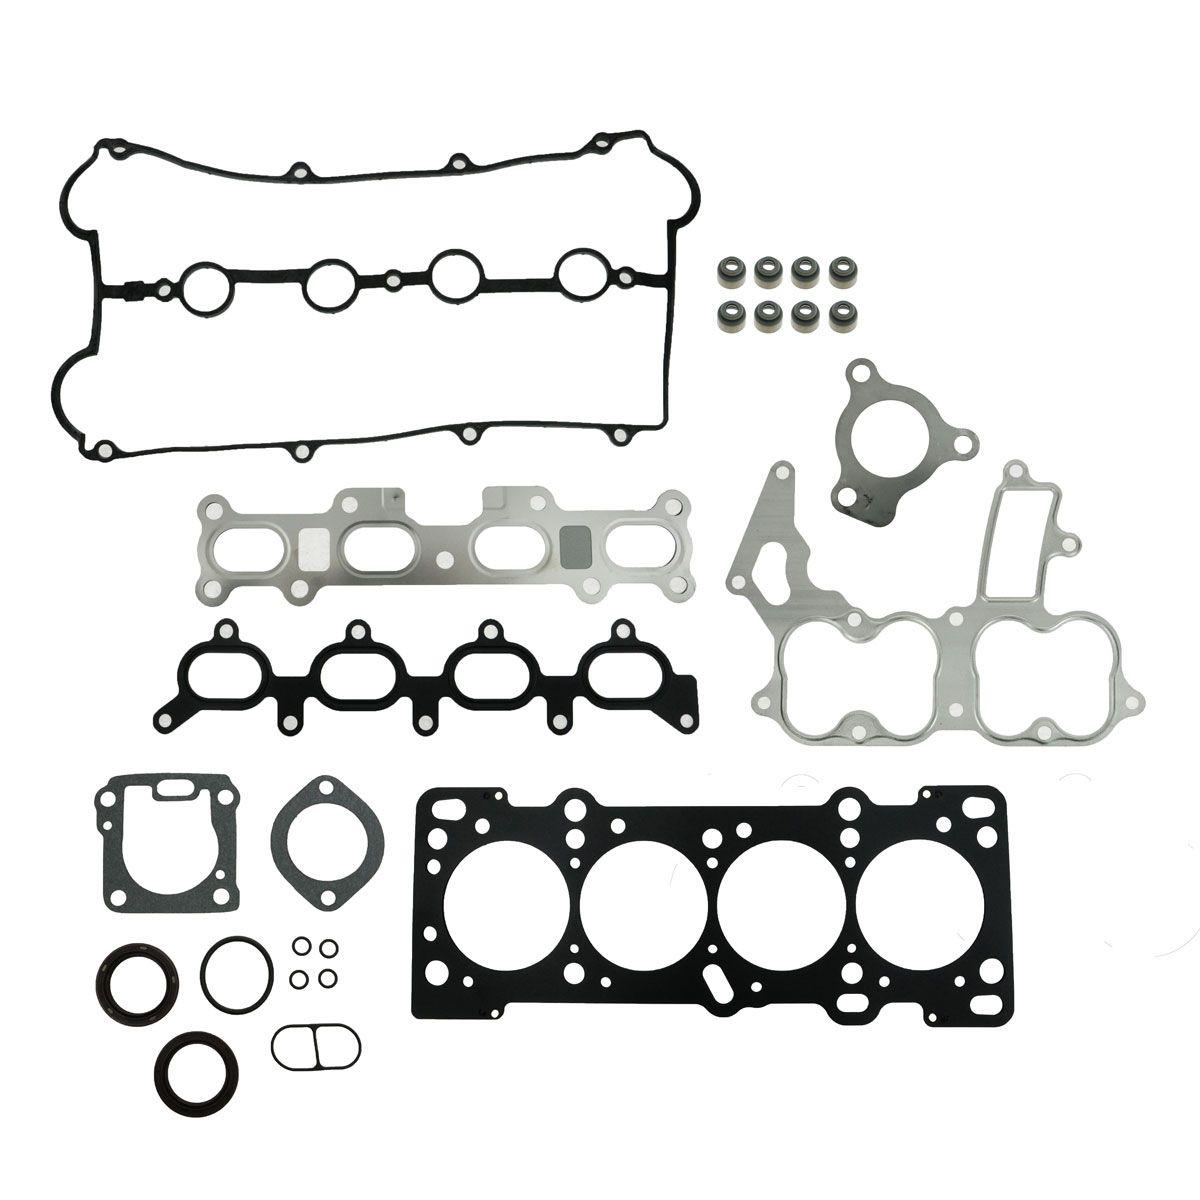 Head Gasket Set Kit For Ford Escort Mercury Tracer Mazda